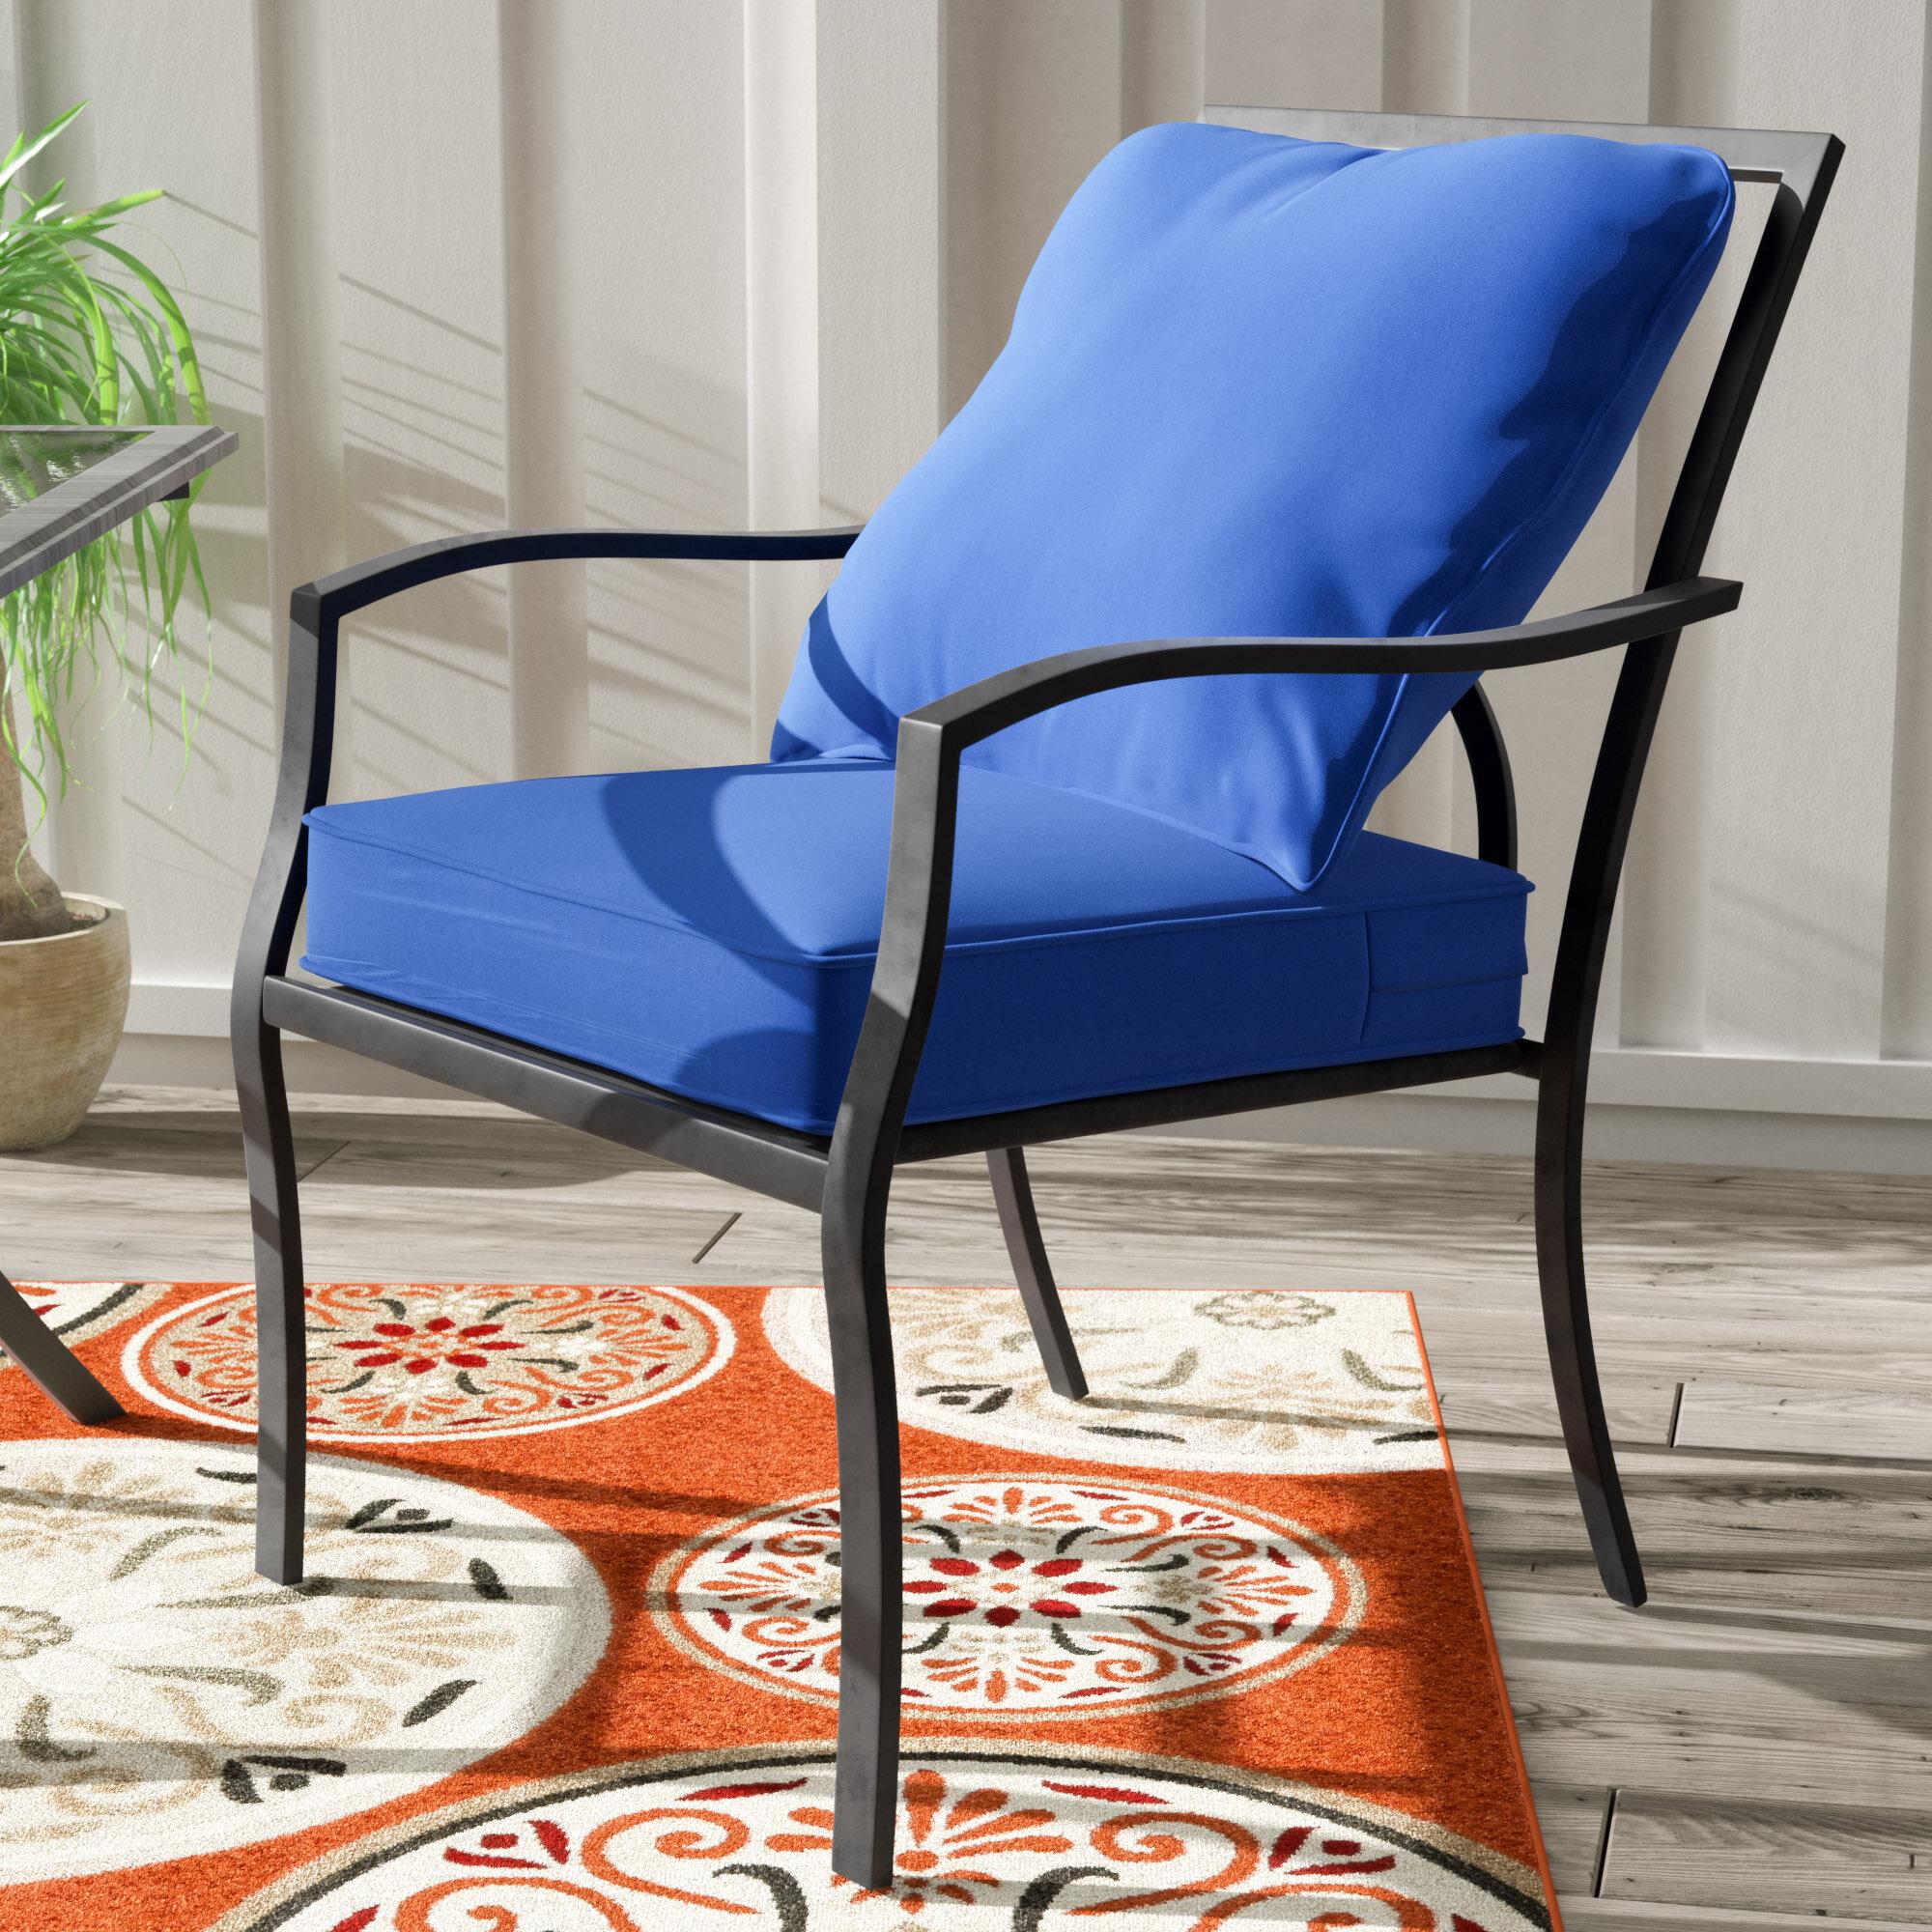 ec6baa95b59 Andover Mills Sarver Indoor Outdoor Lounge Chair Cushion   Reviews ...